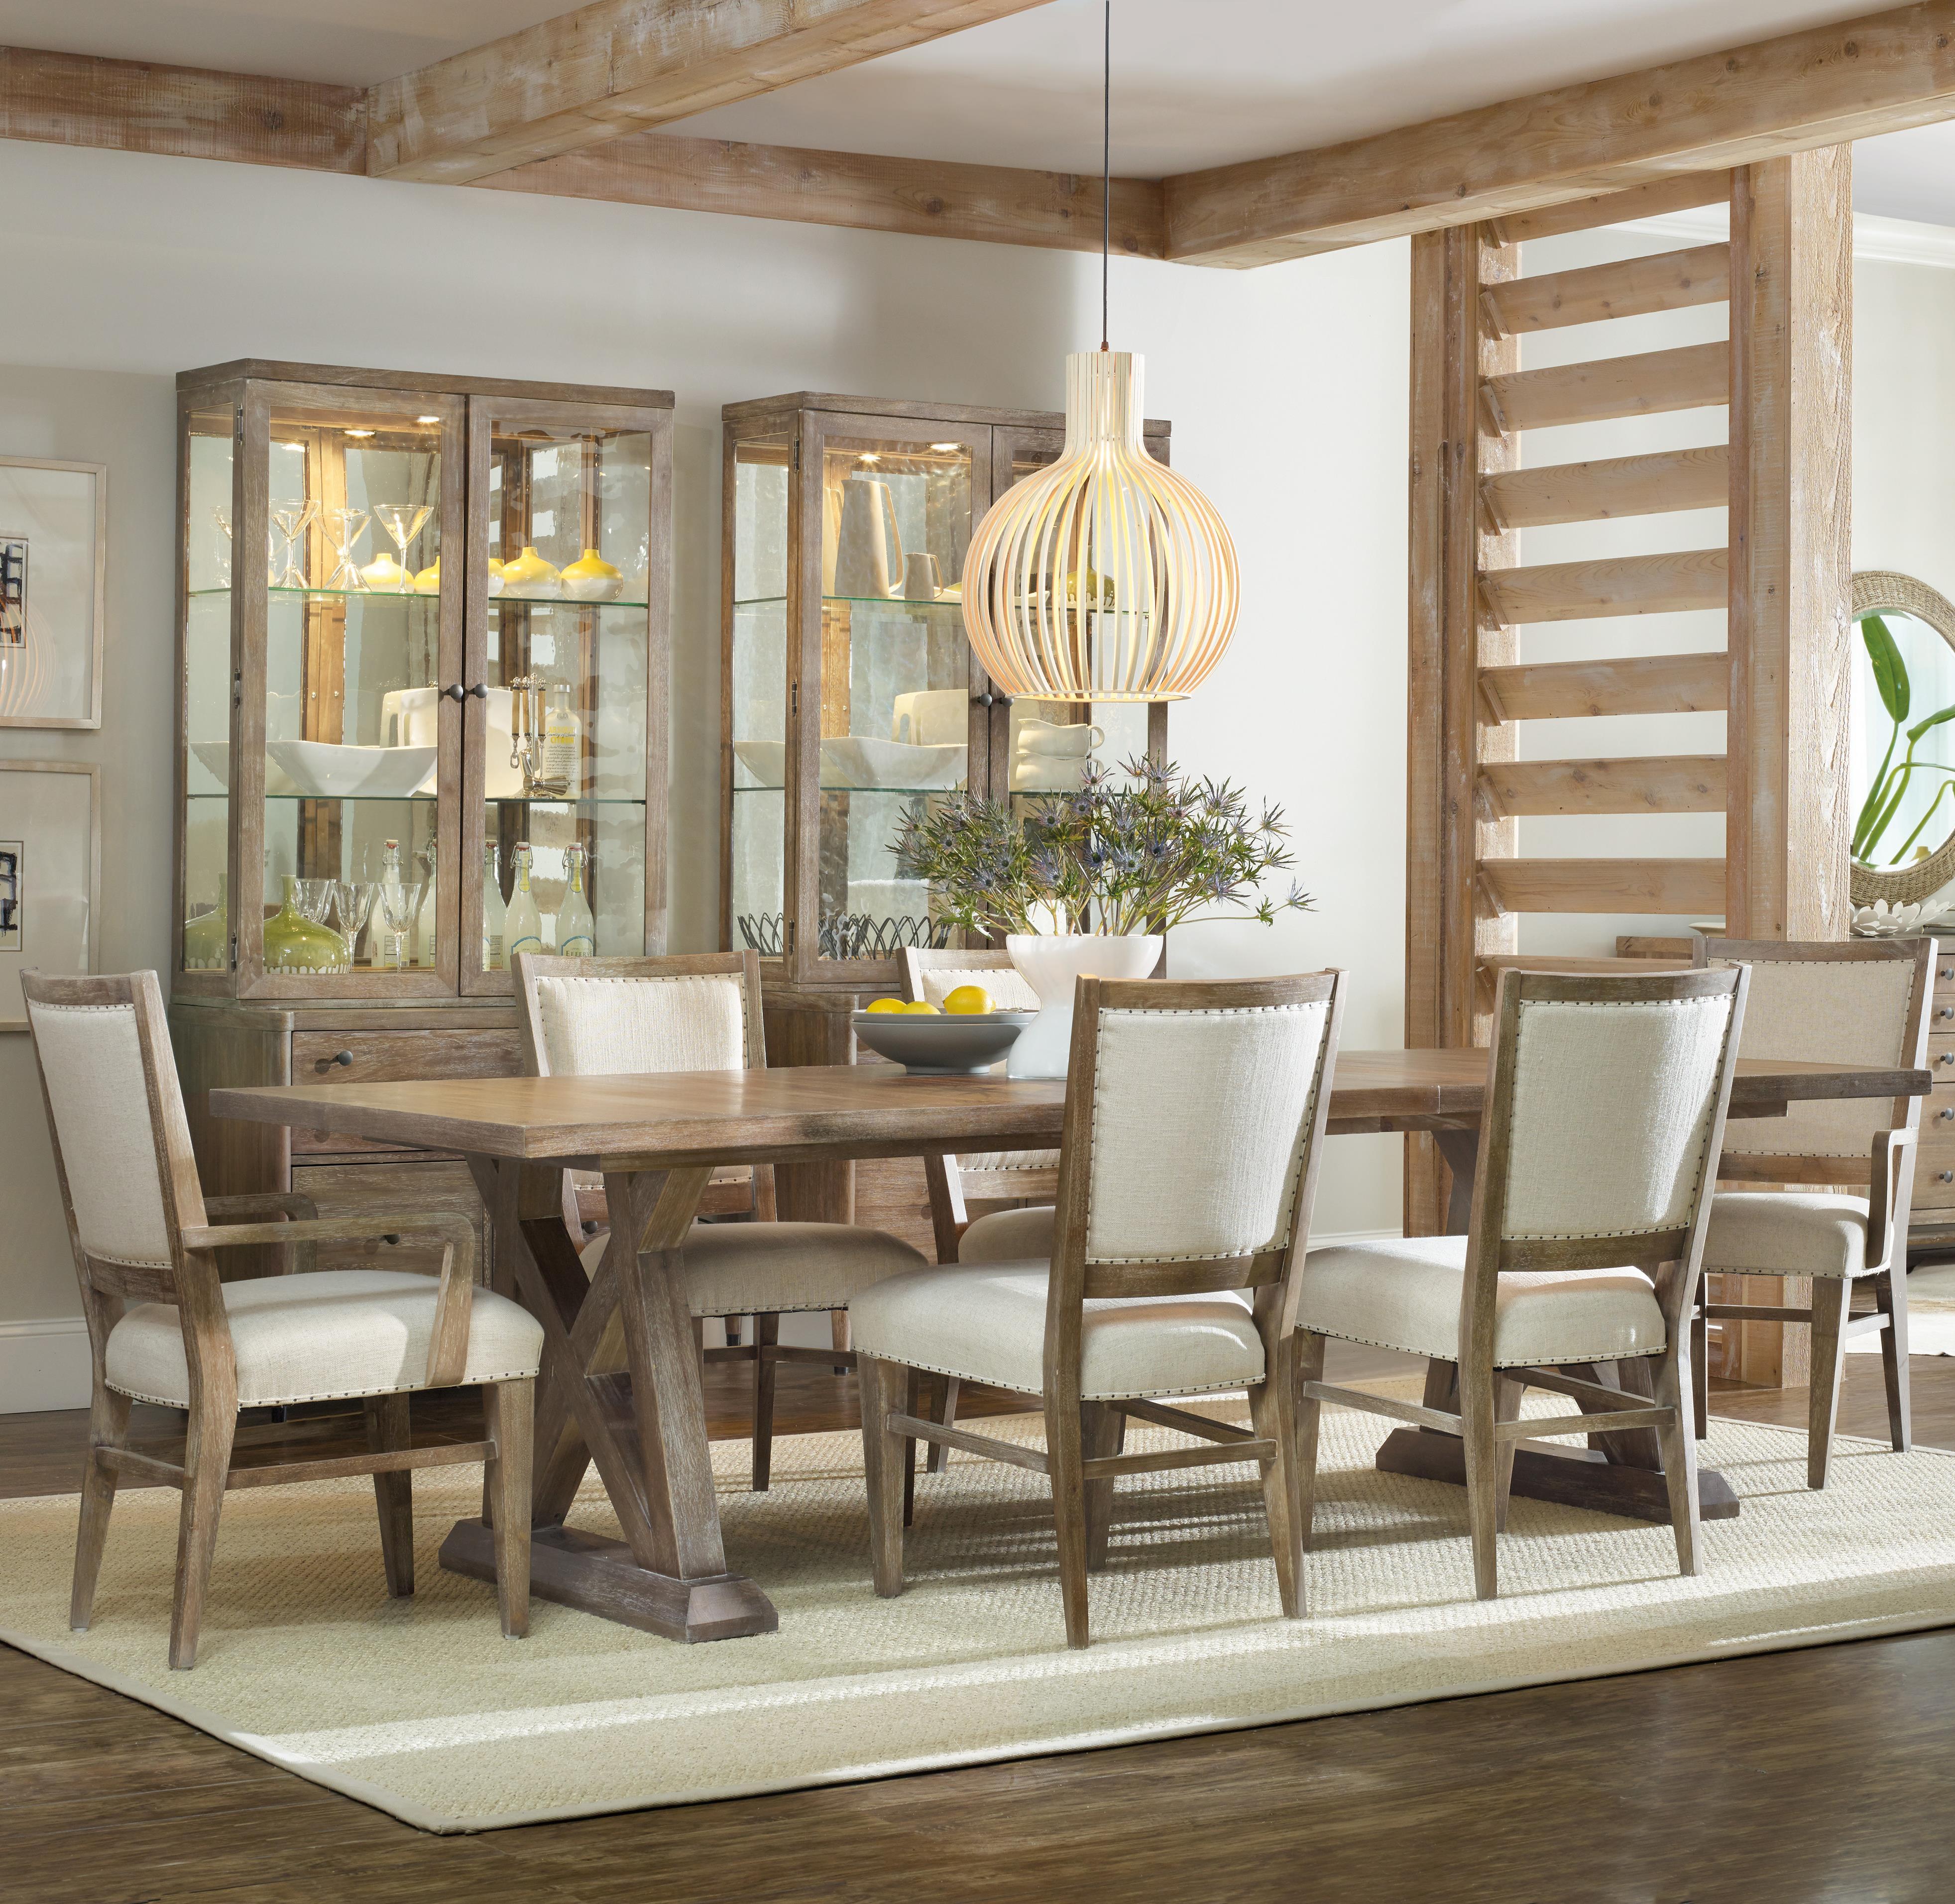 Studio 7H 7 Piece Dining Set by Hooker Furniture at Baer's Furniture